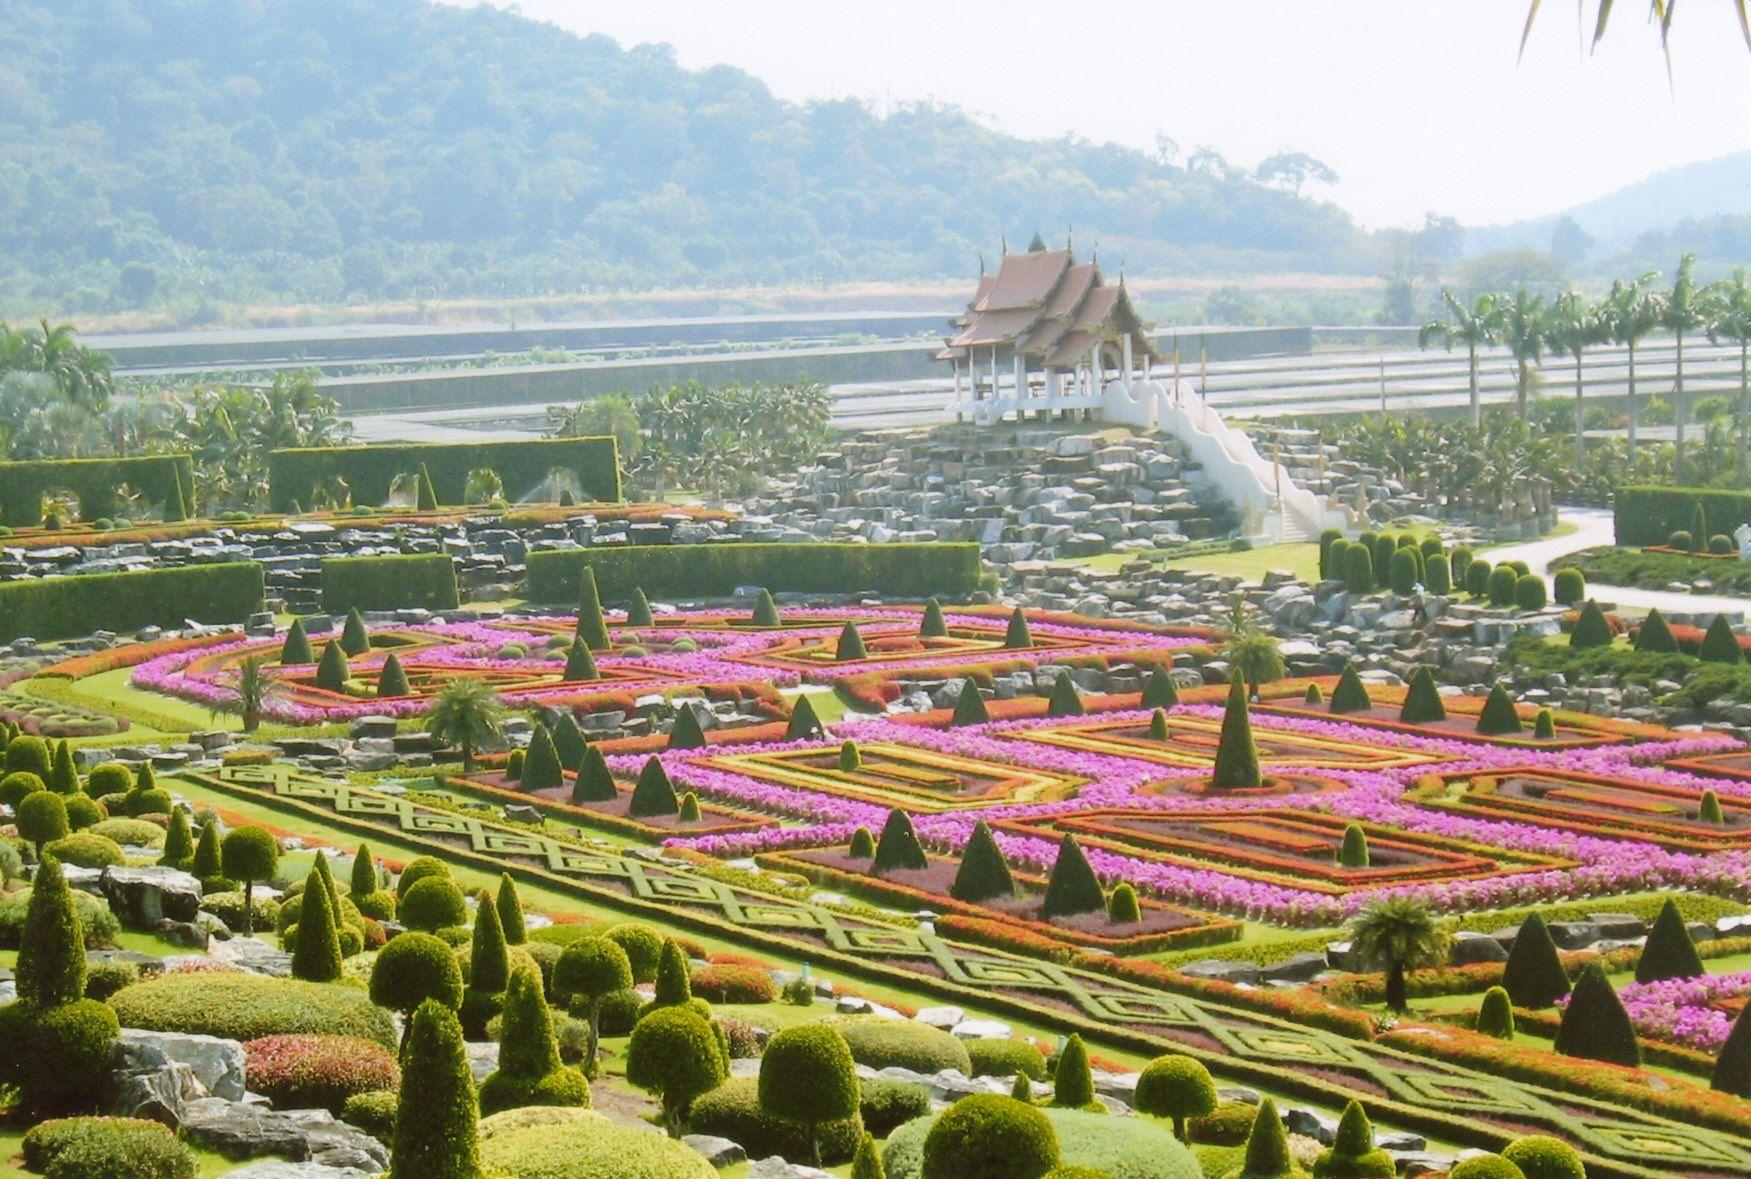 جمال حديقه سانام لوانغ بارك فى تايلاند | شاهد روعه وجمال حديقة سانام لوانغ